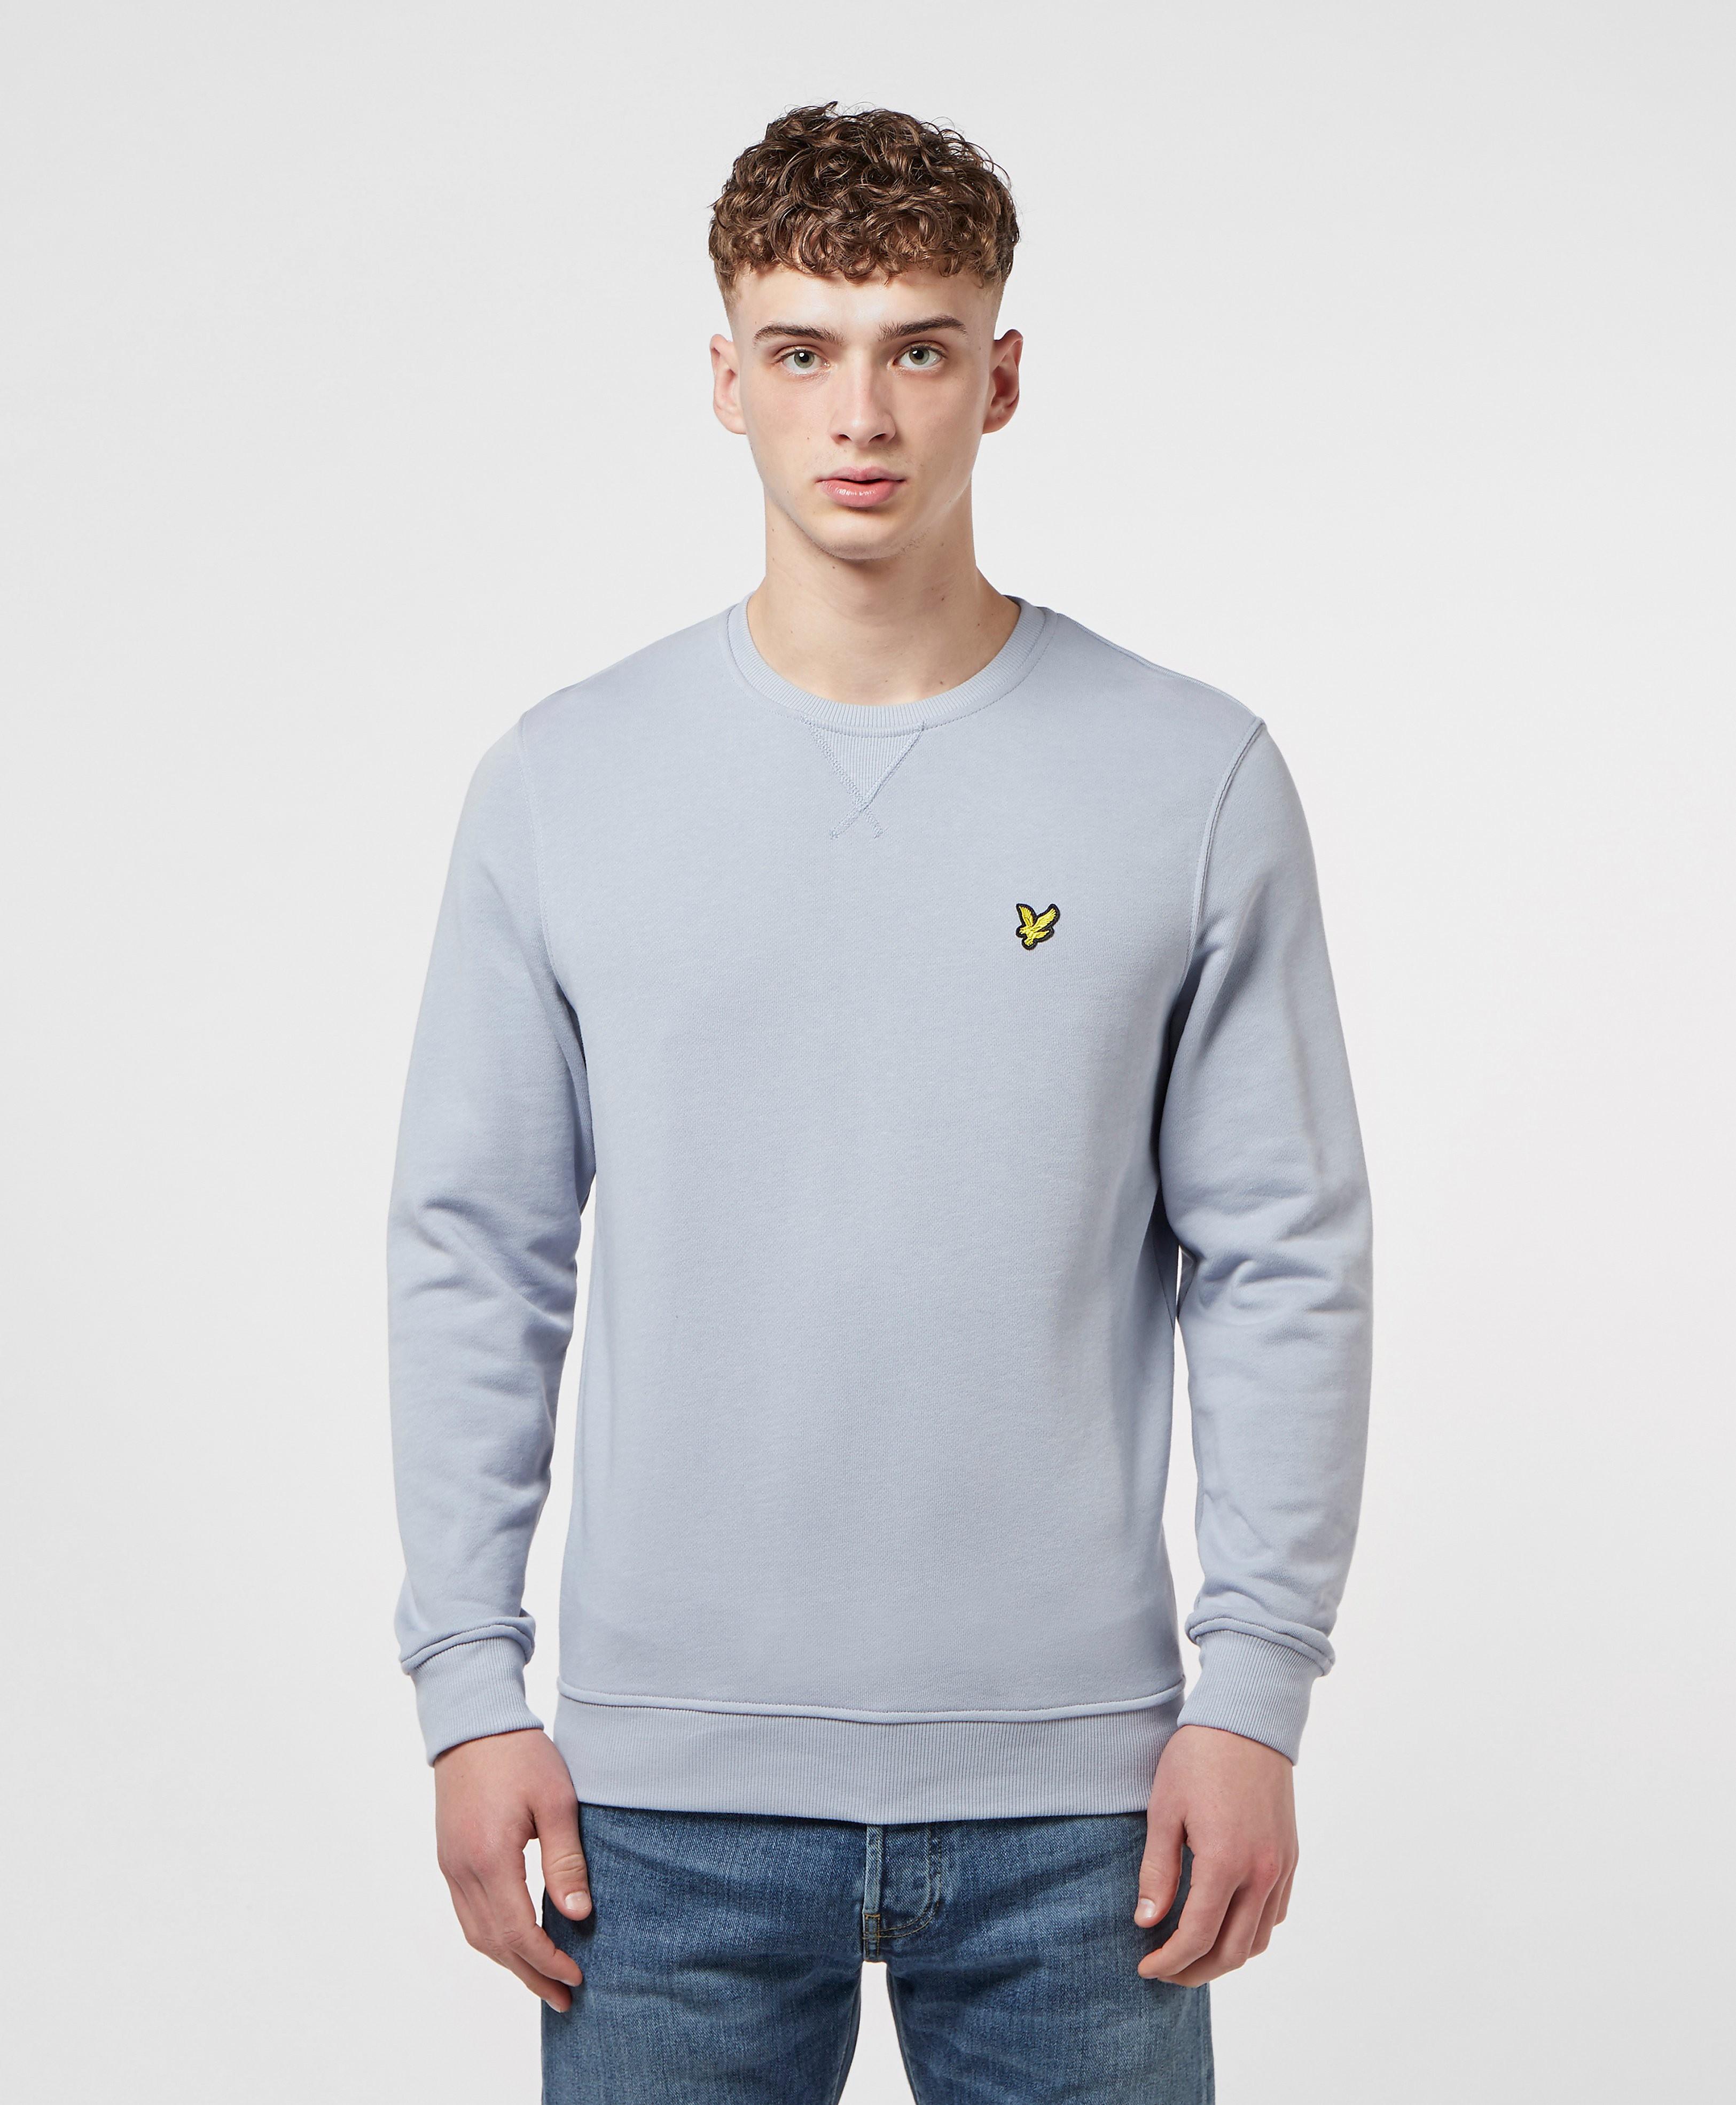 Lyle & Scott Crew Sweatshirt